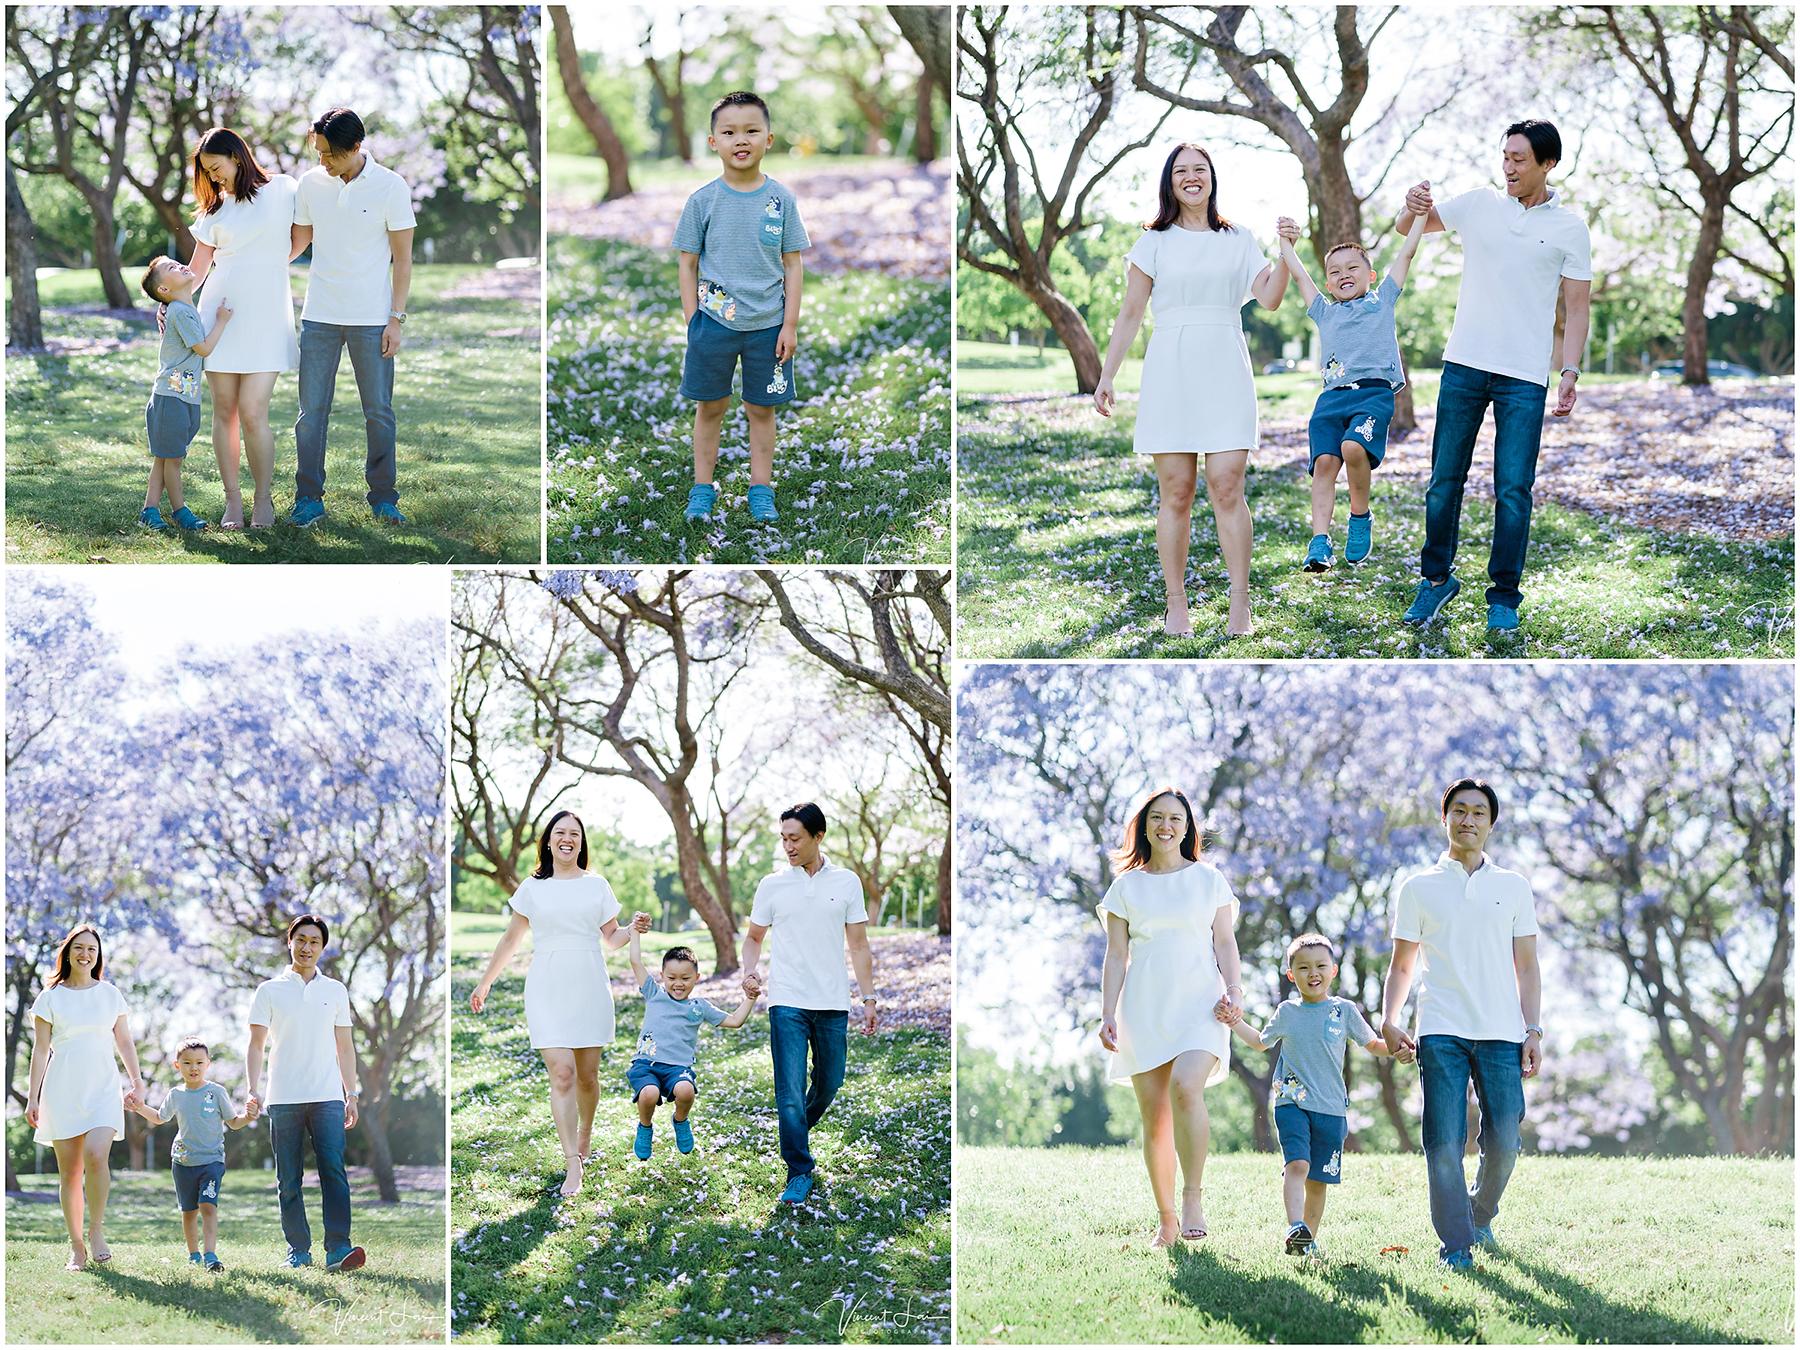 Family Photos During Jacaranda Season